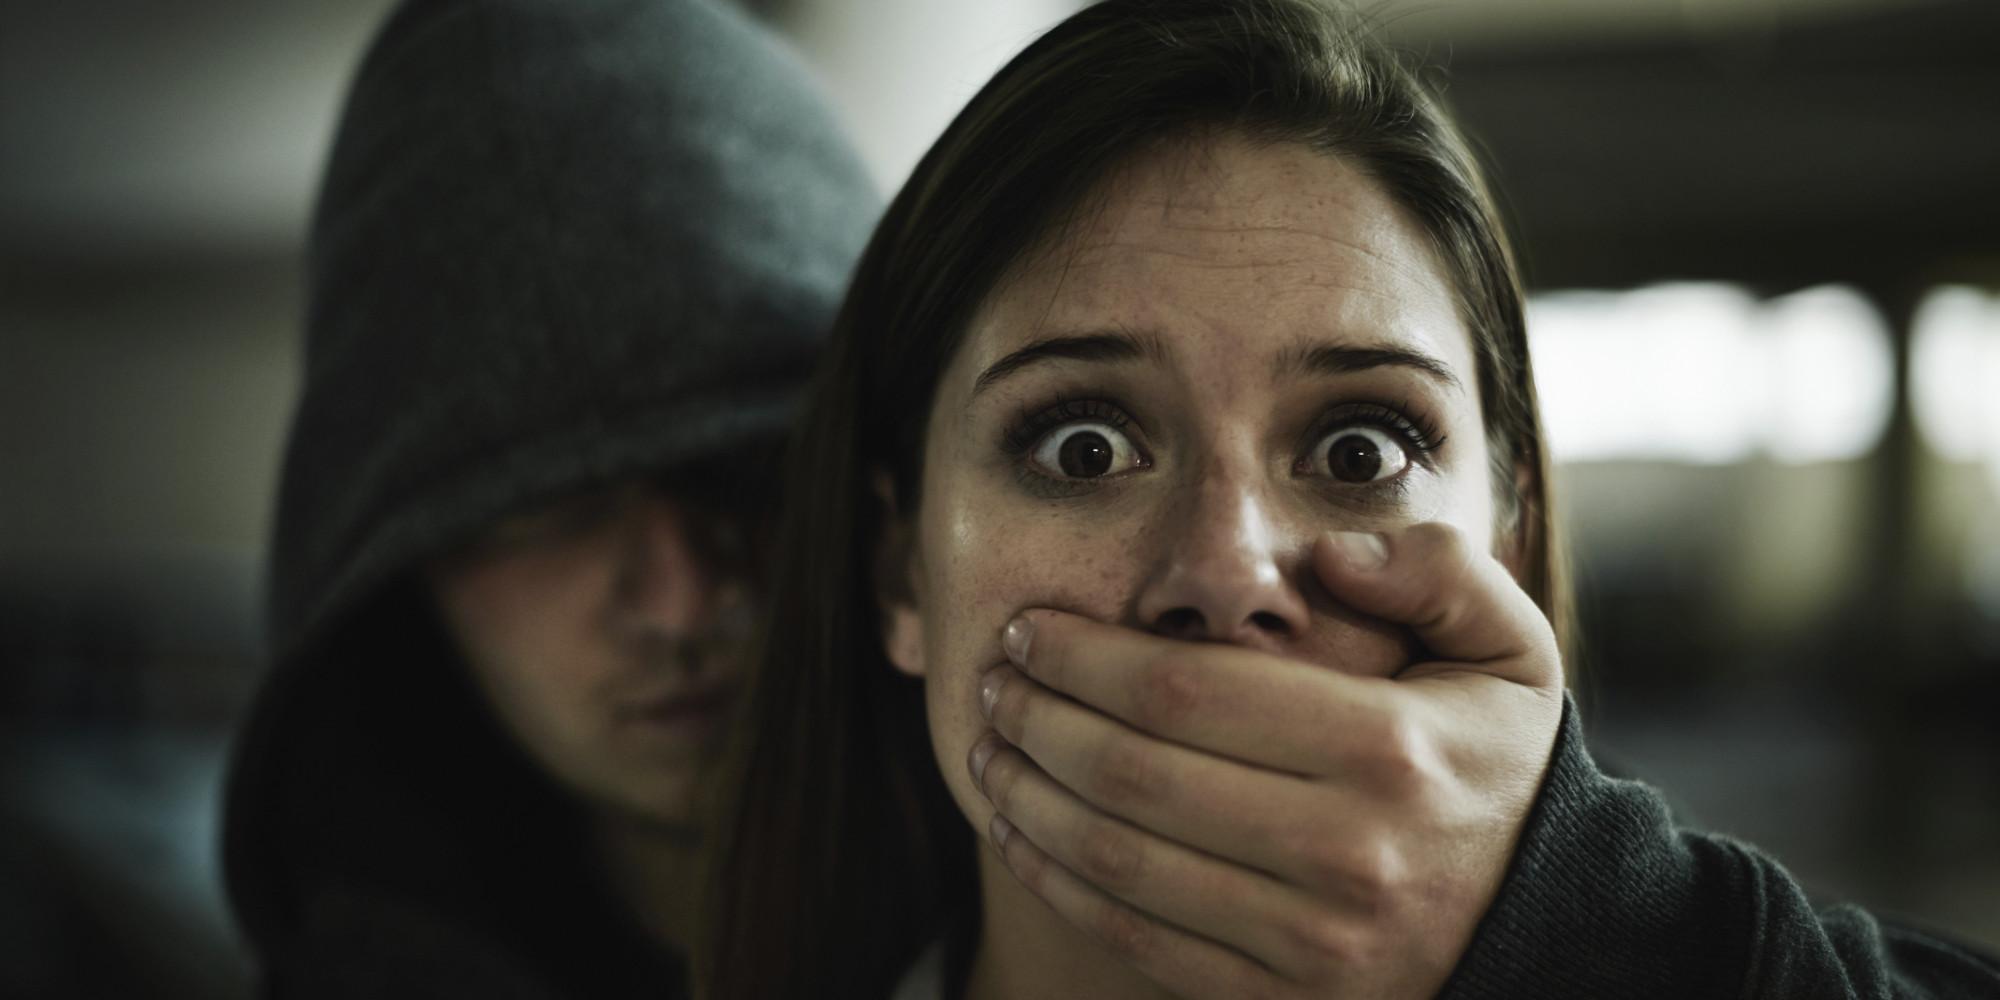 15 Horrifying Kidnap Stories That'll Keep Us Awake At Night